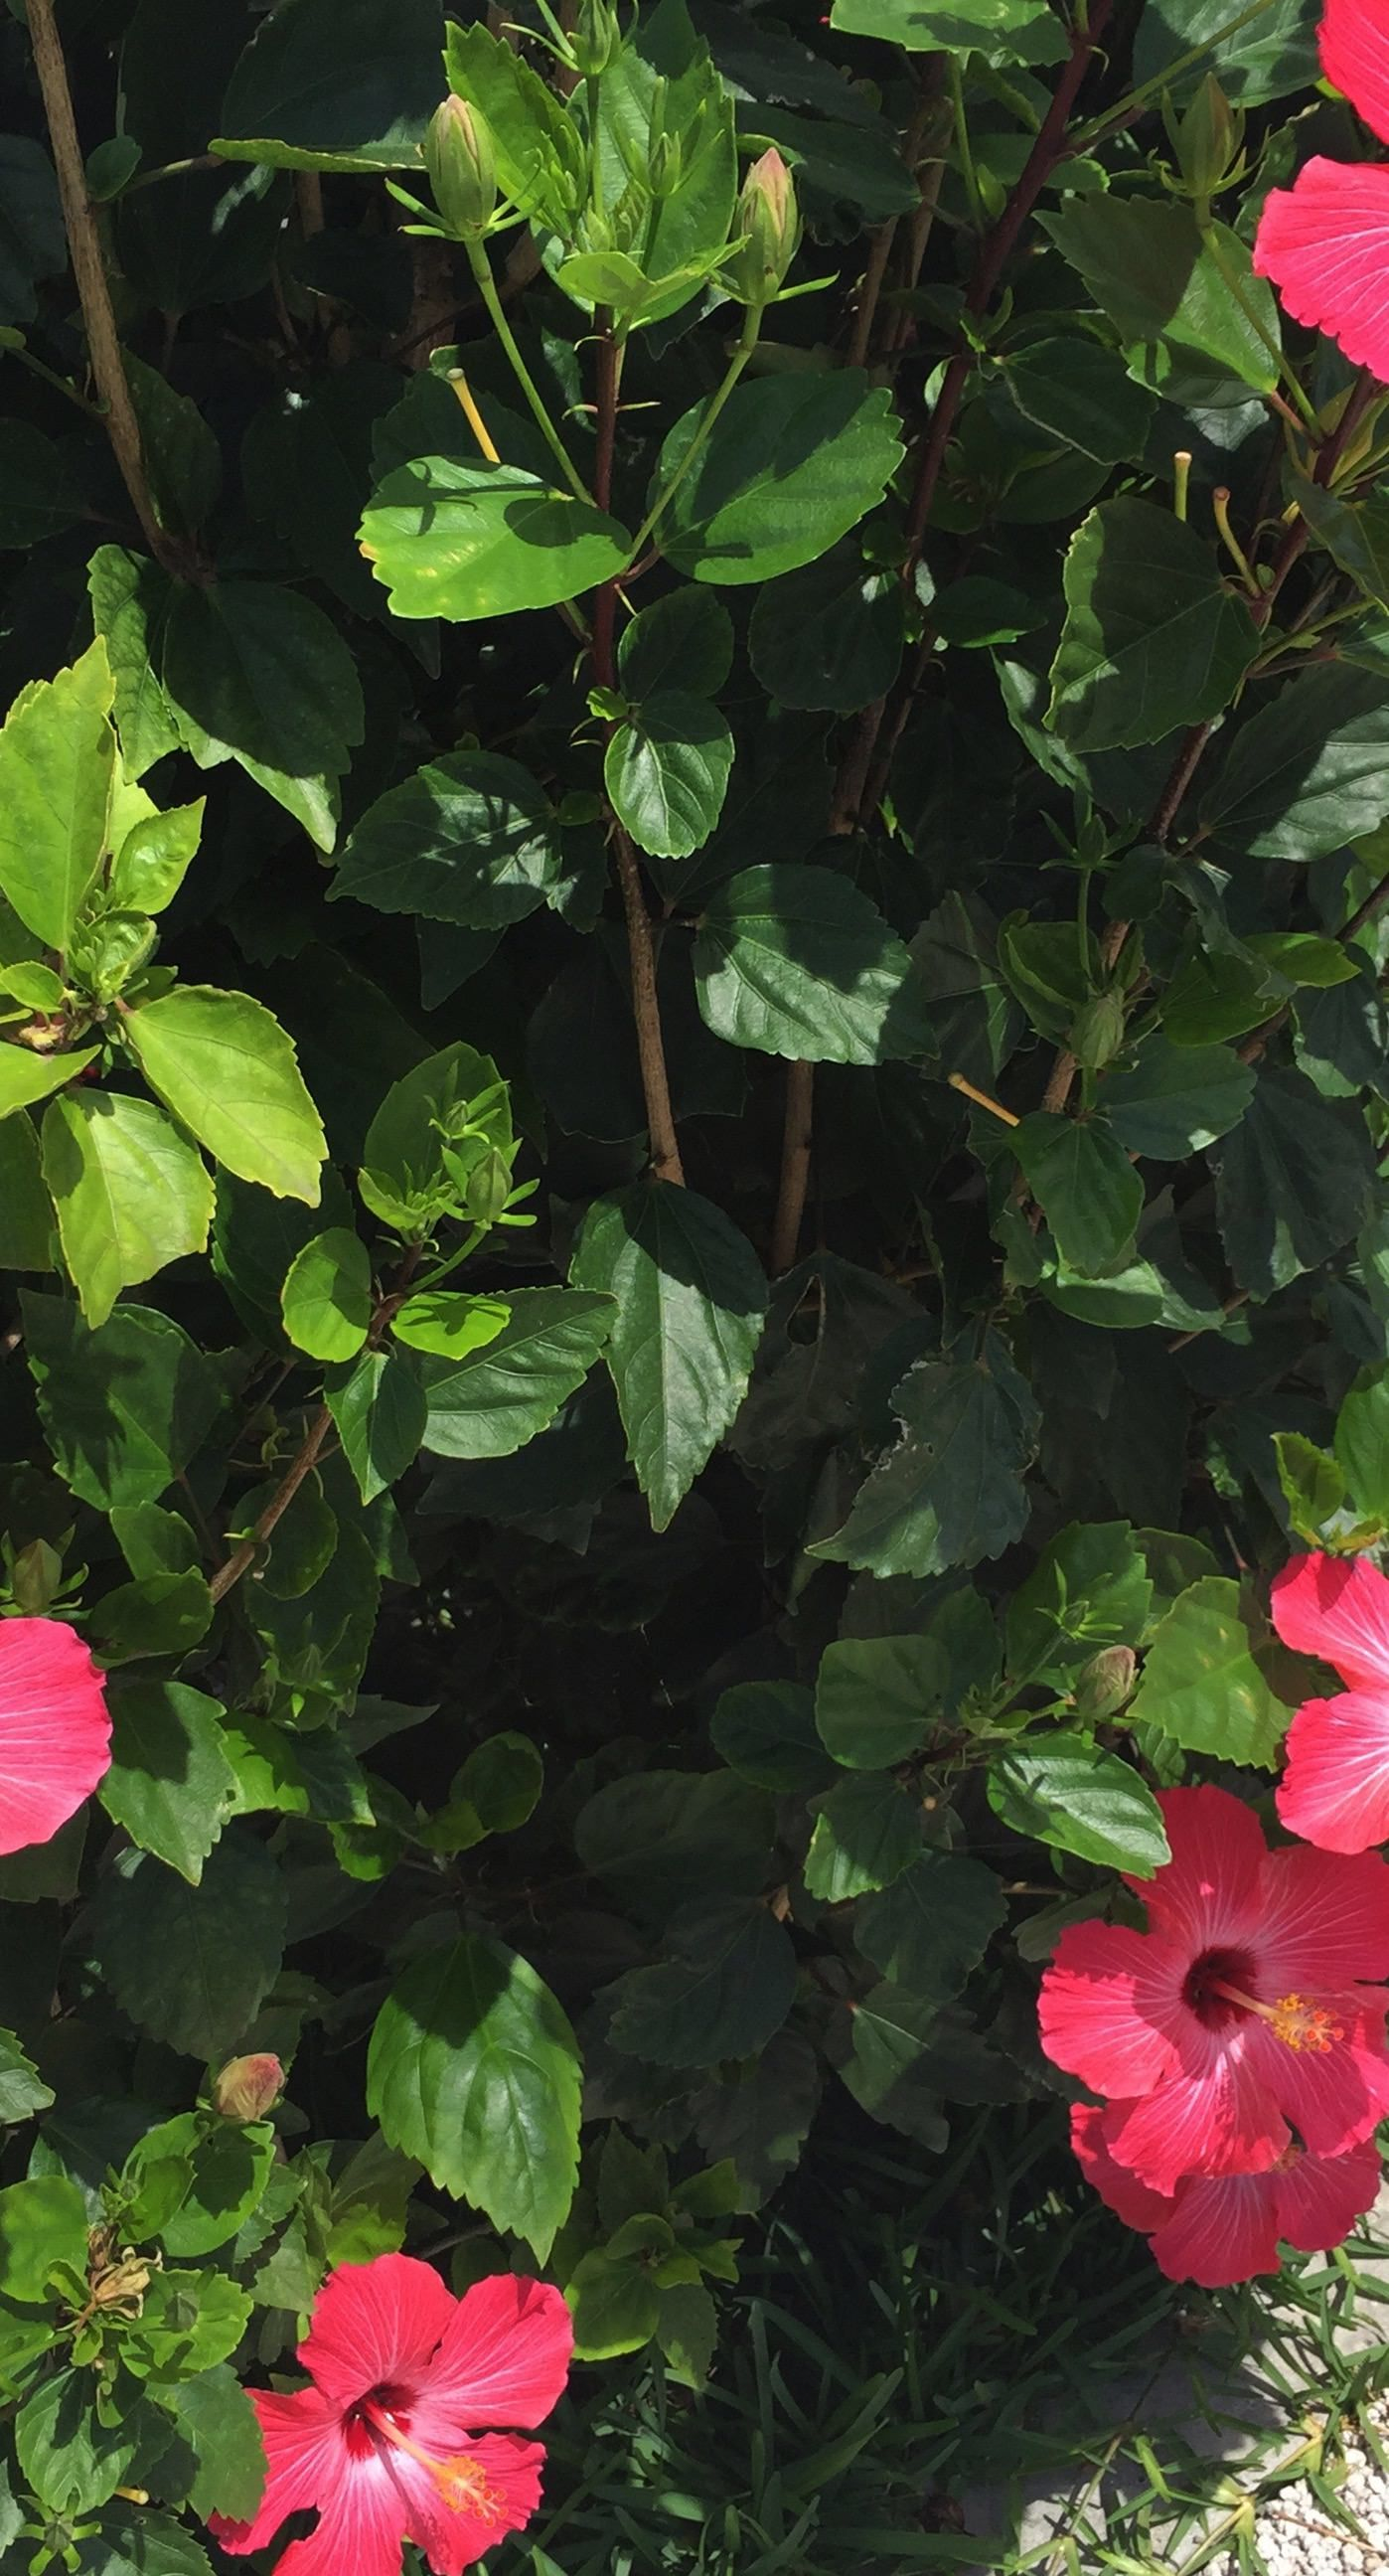 Tanaman Bunga Kembang Sepatu Hijau Merah Wallpaper Sc Iphone8plus Kembang Sepatu Bunga Kembang Sepatu Bunga